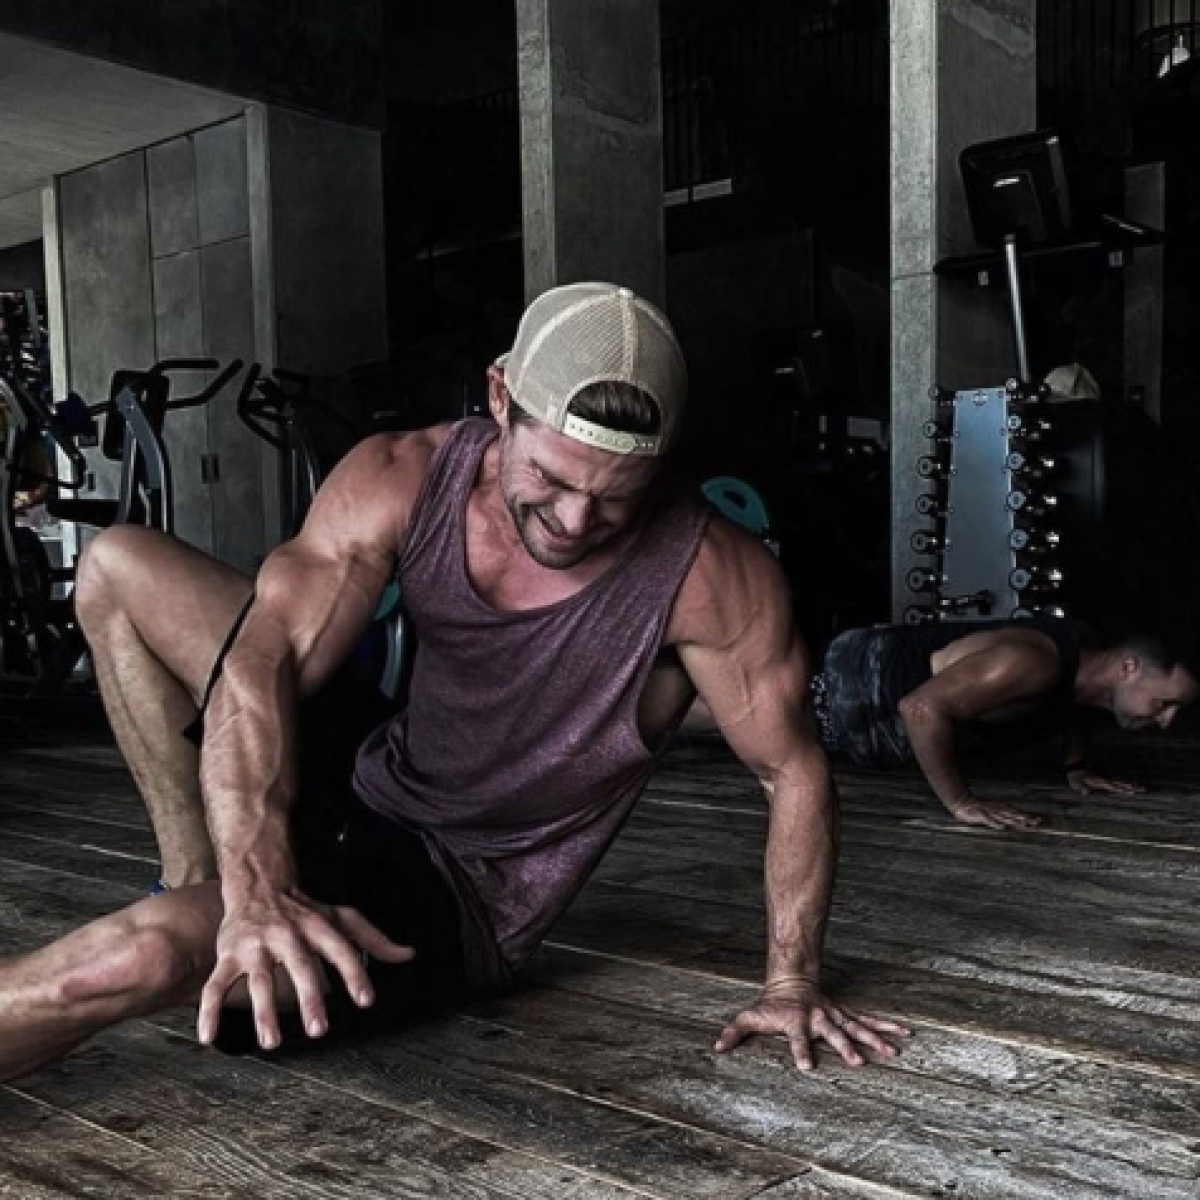 Chris Hemsworth offers his workout regimes for free amid coronavirus lockdown